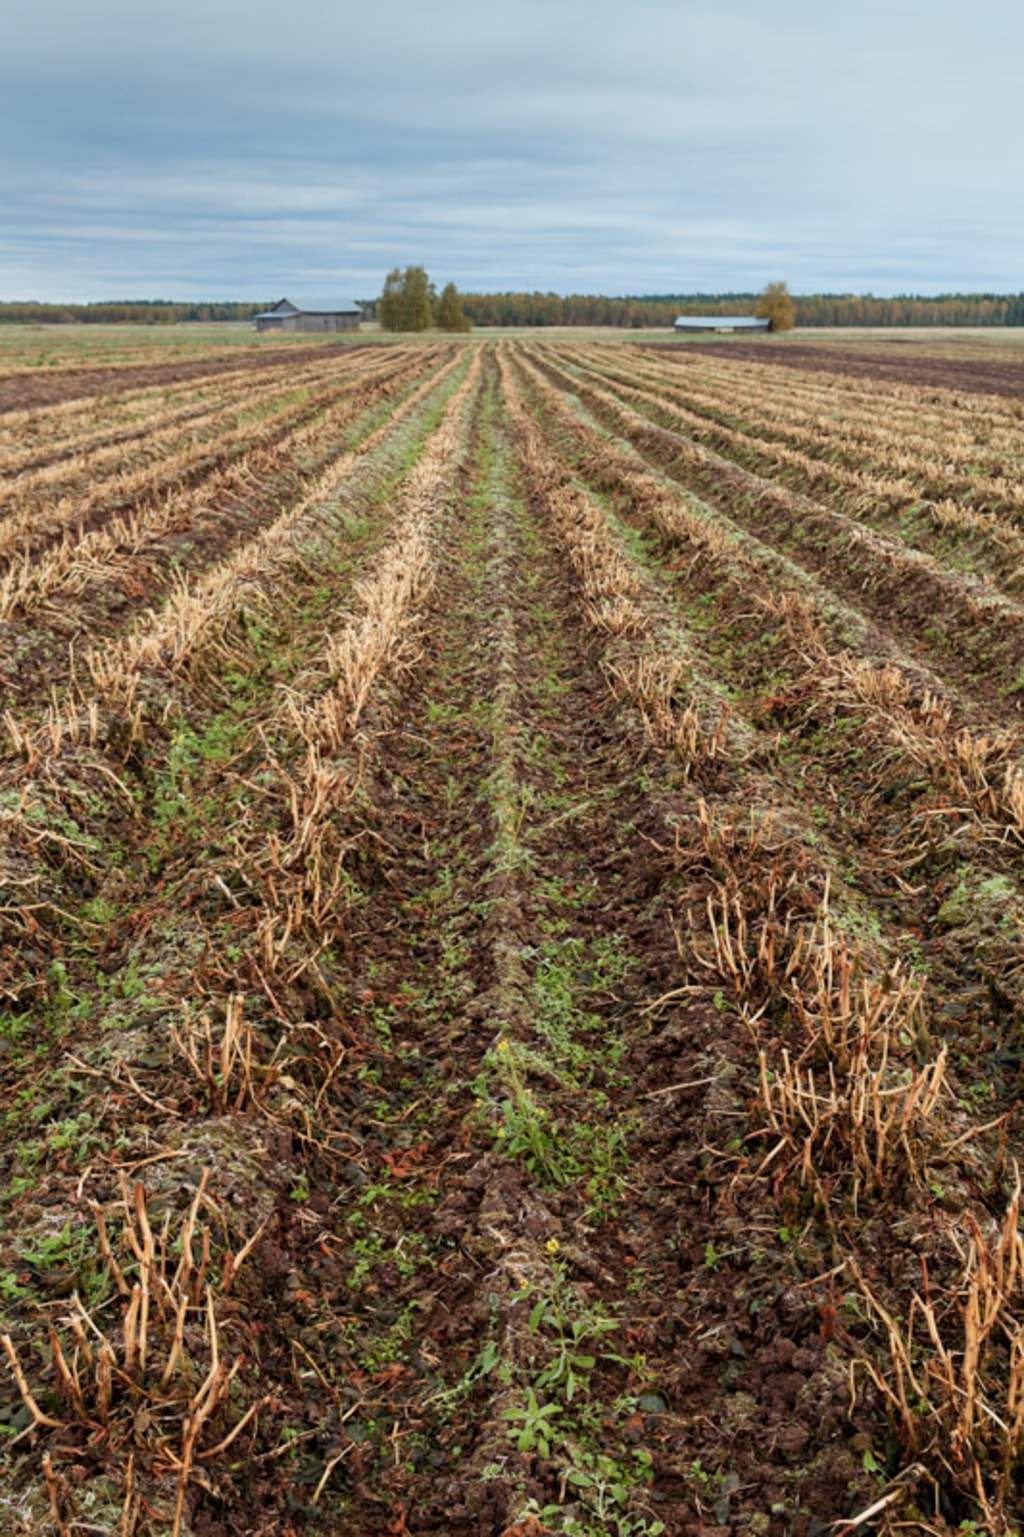 The plows of an autumn field lead to the old barn houses at ... via Jukka Heinovirta